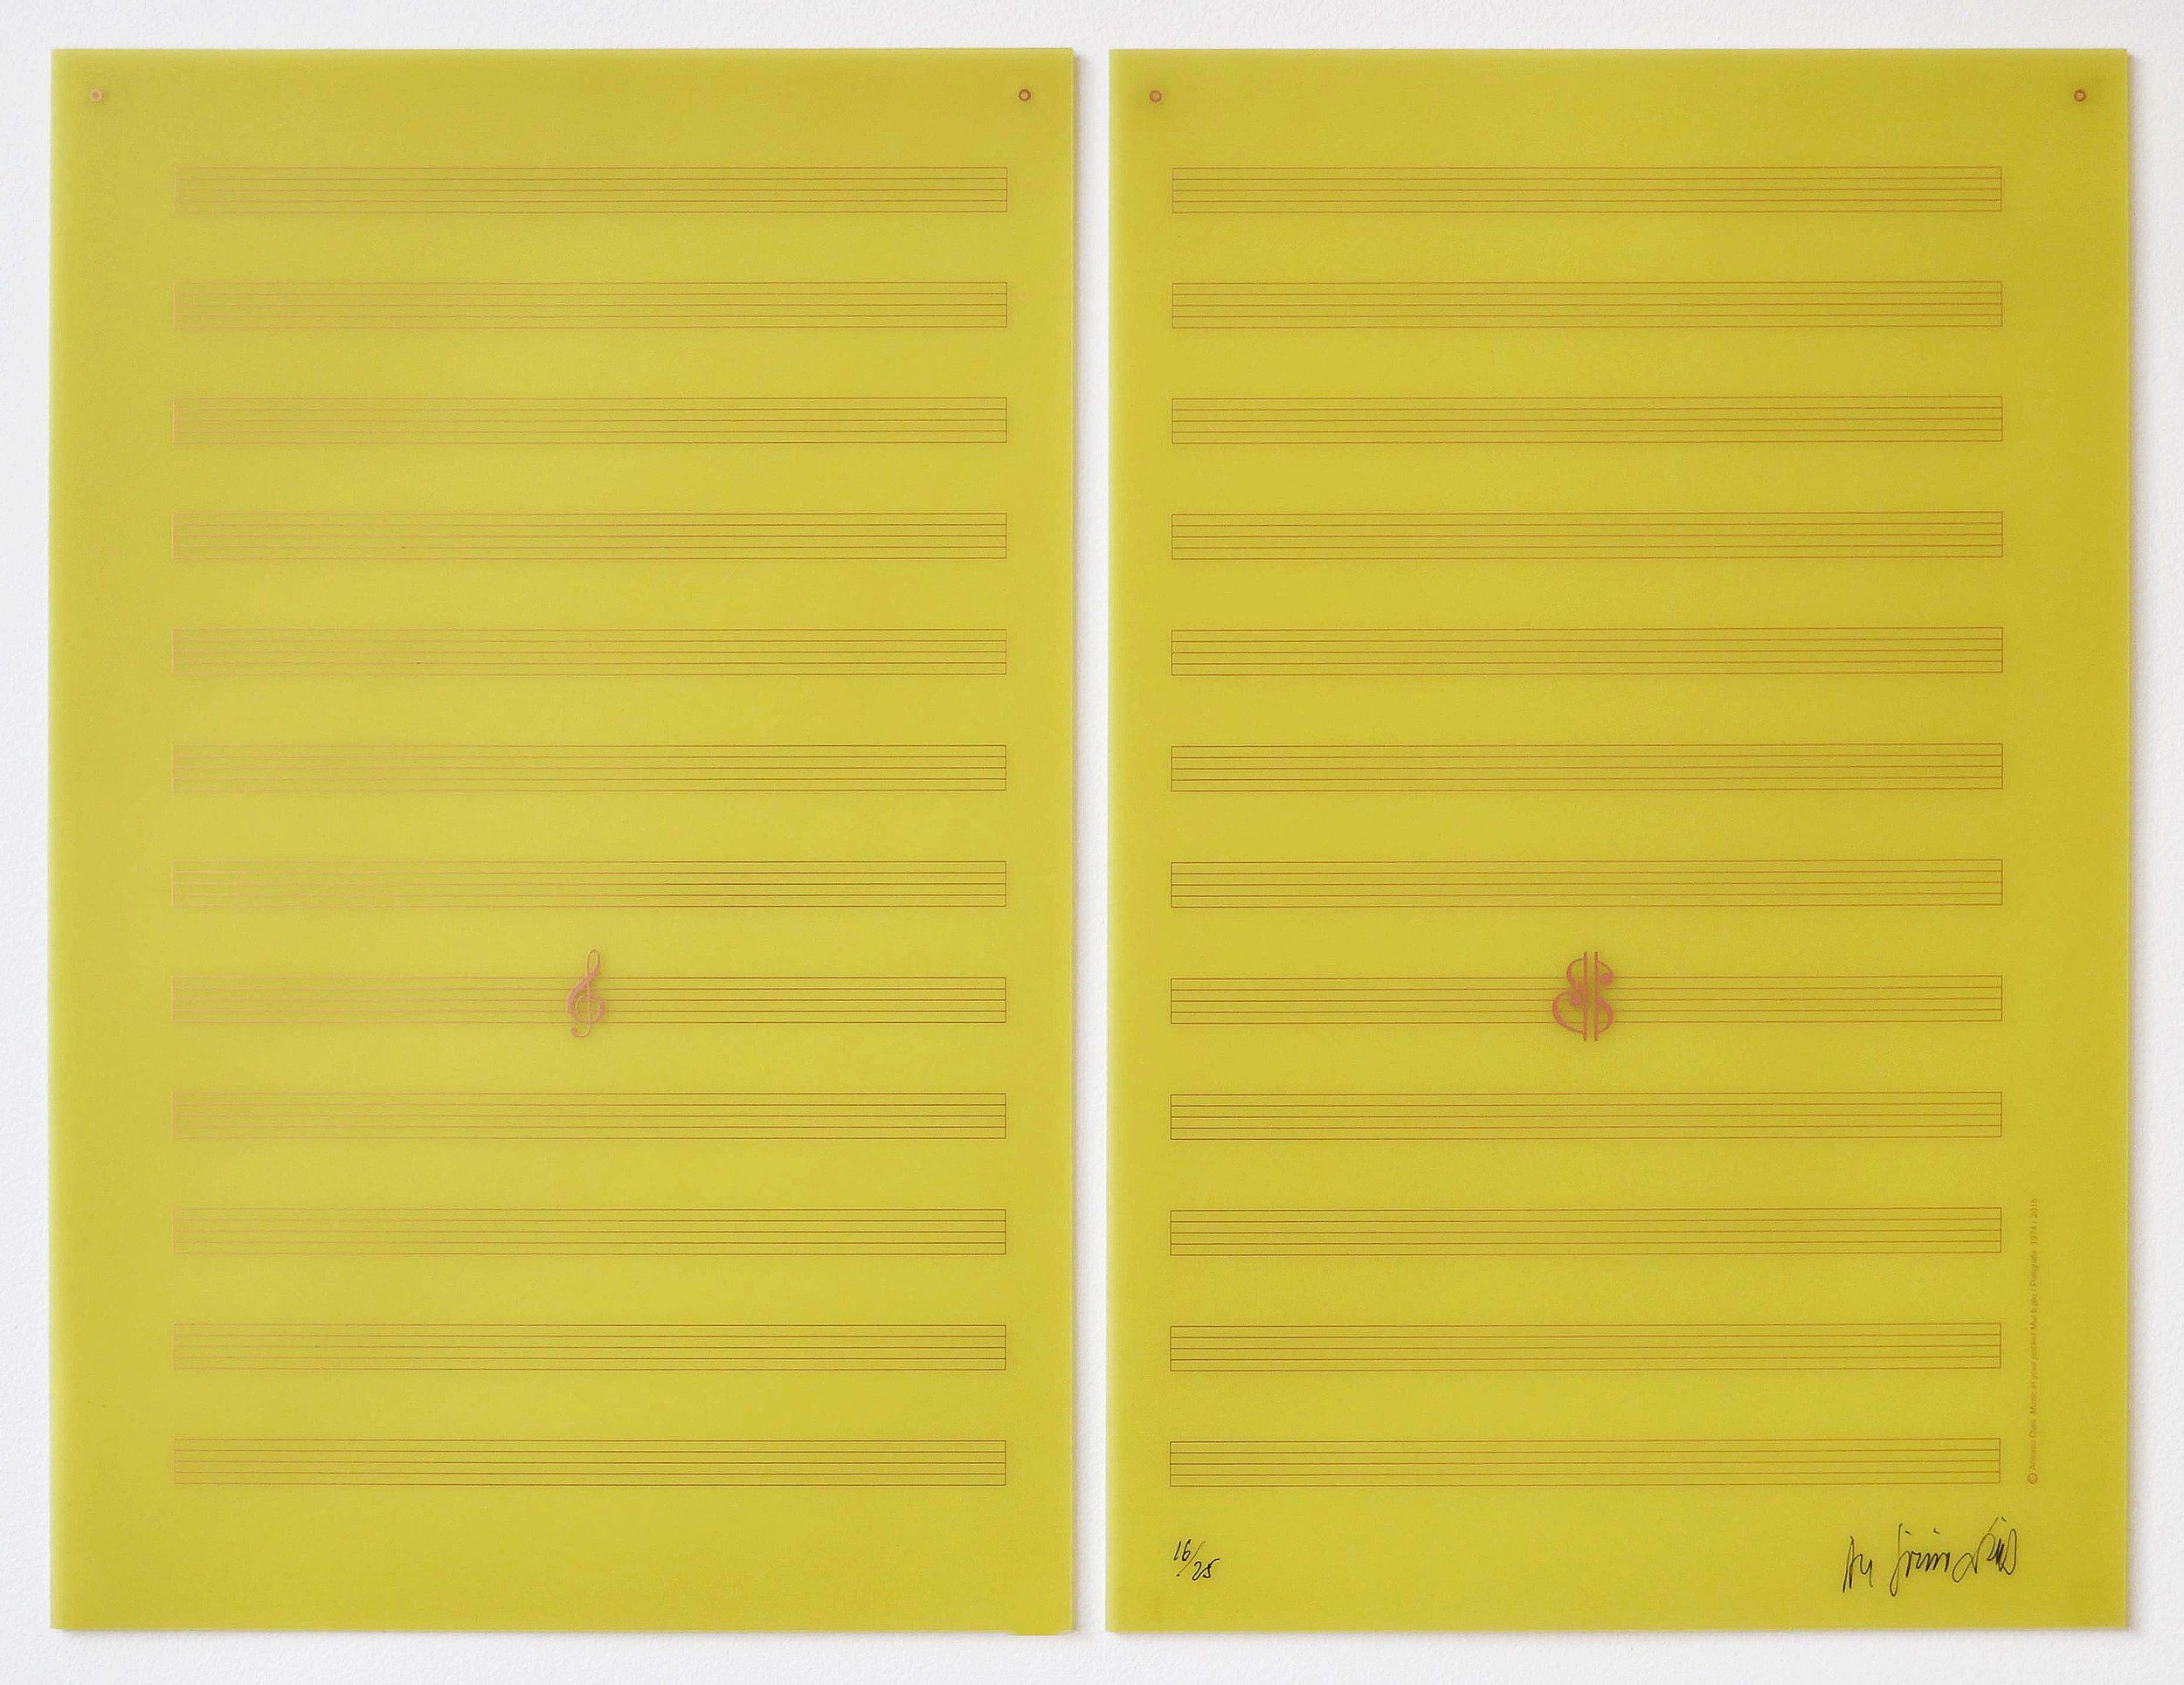 Mul.ti.plo Espaço Arte. Antonio Dias, Music in Your Pocket , 2015